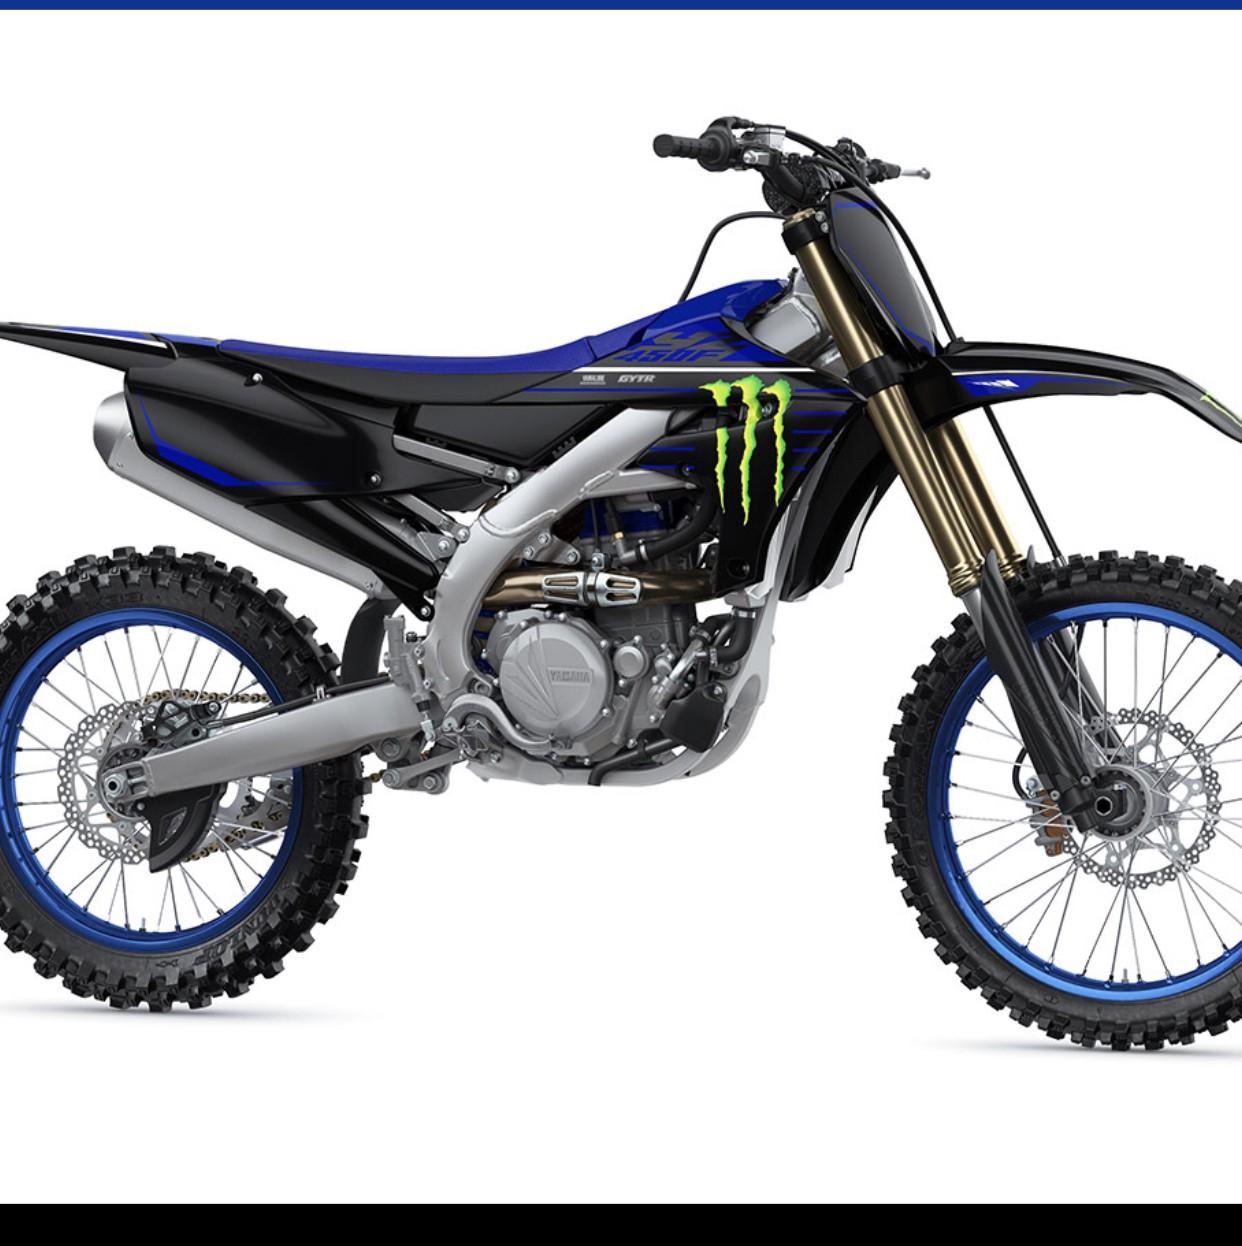 275EB19C-5667-4BA6-837E-C61279D48BAA - Marshall_Crabtree - Motocross Pictures - Vital MX